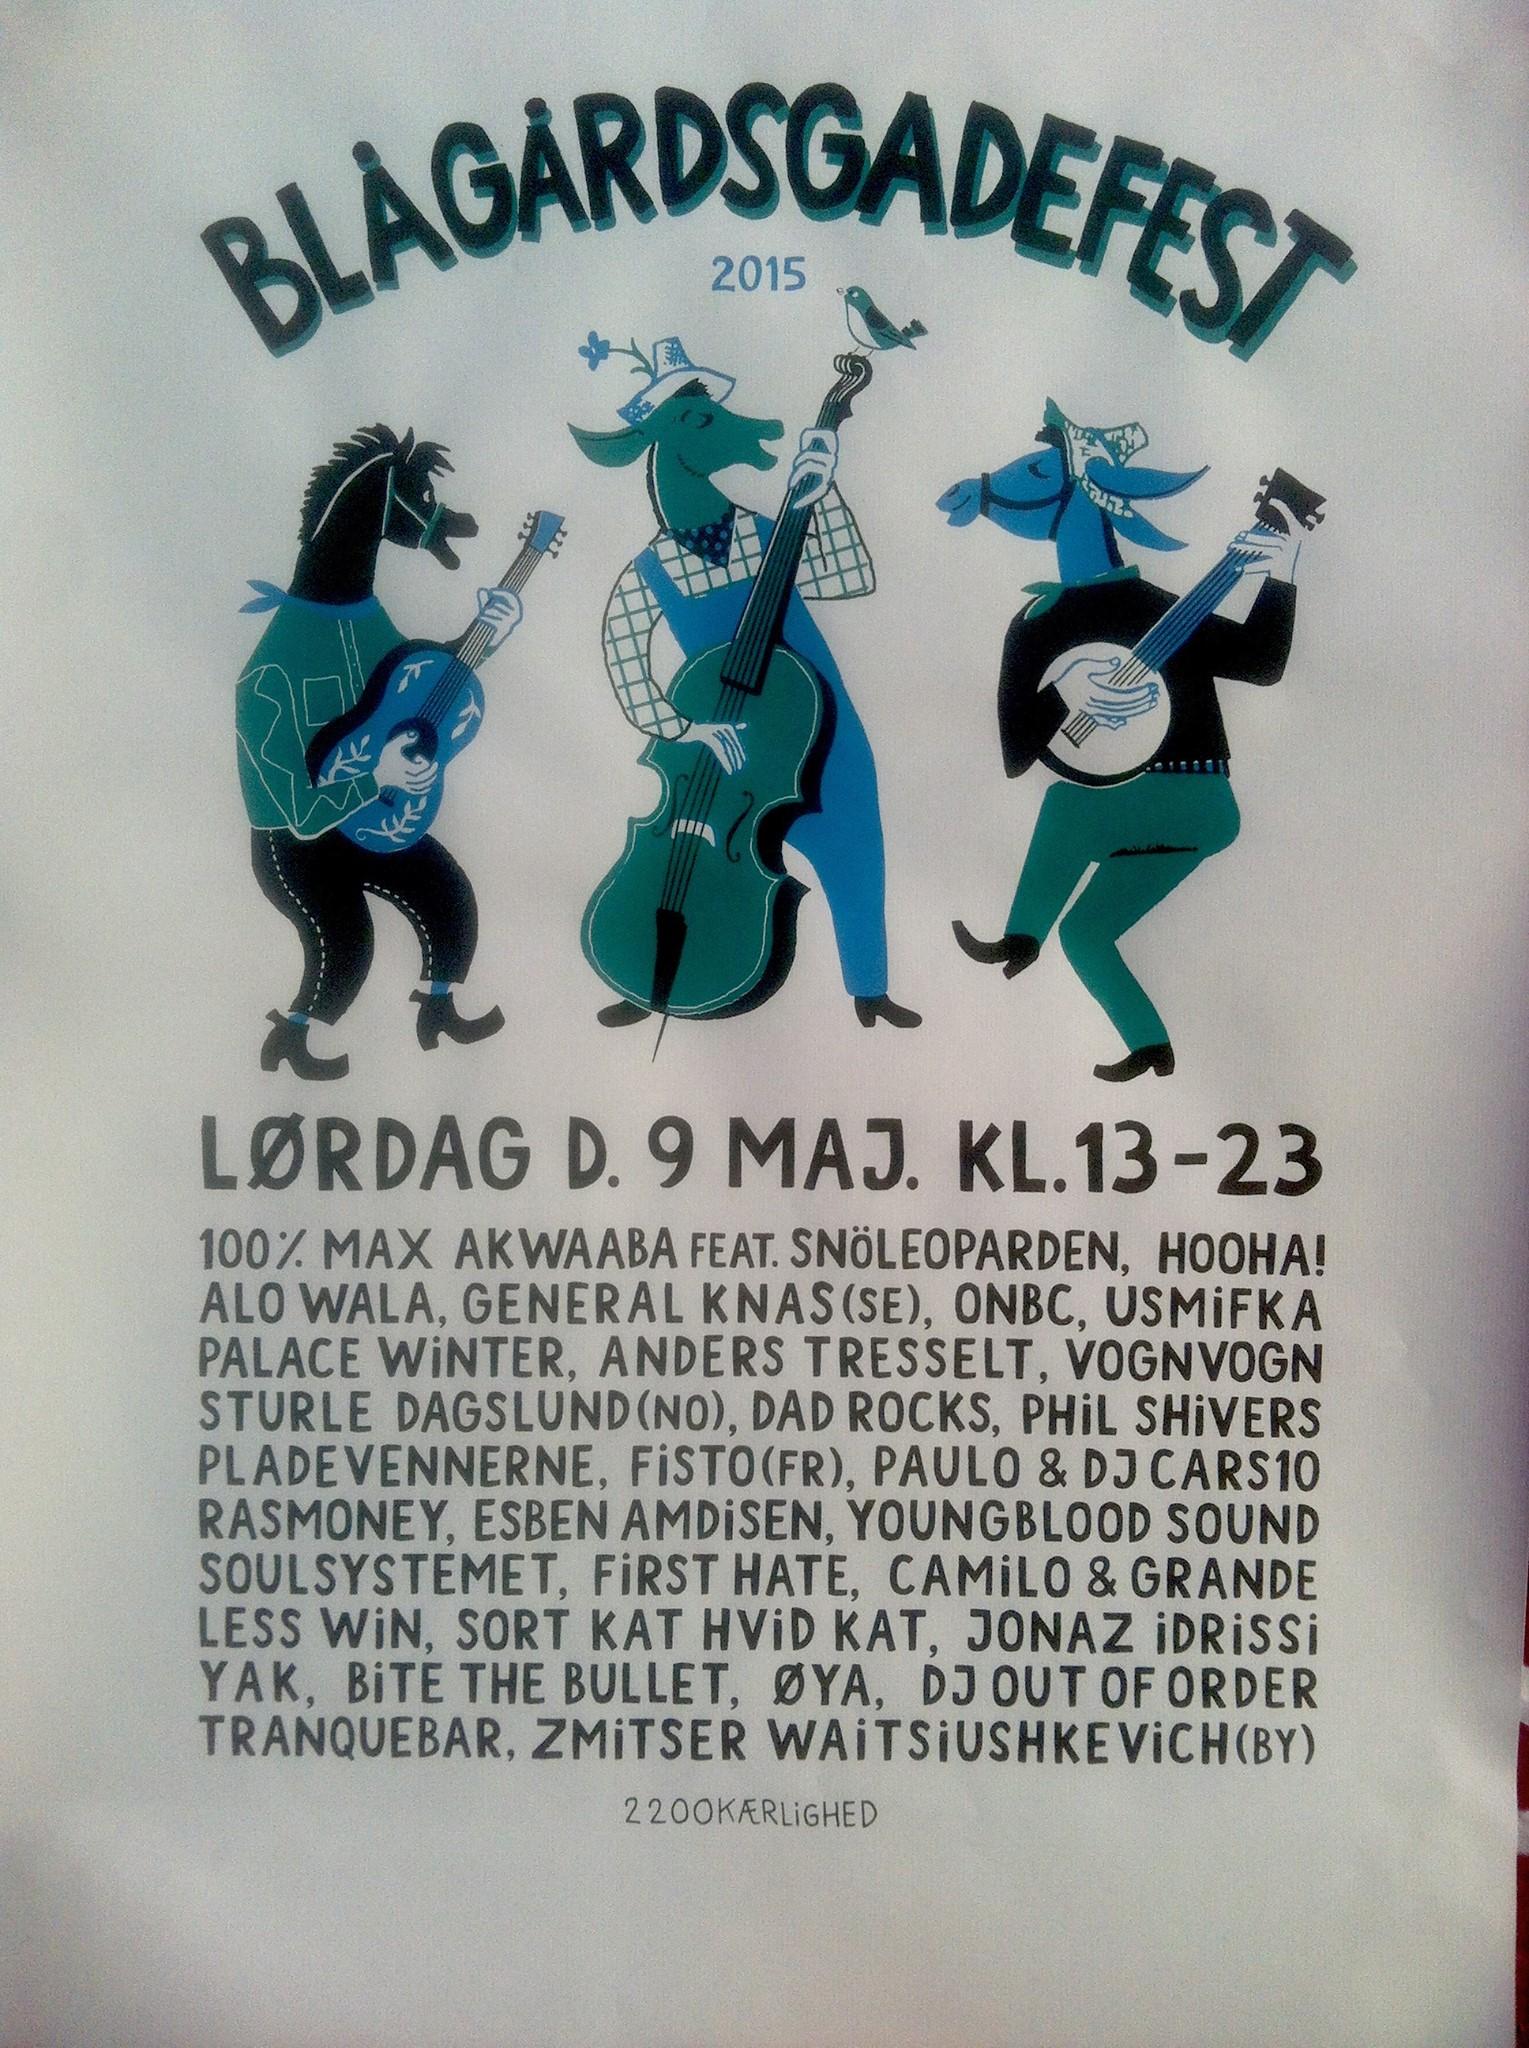 blaagaardsgadefest